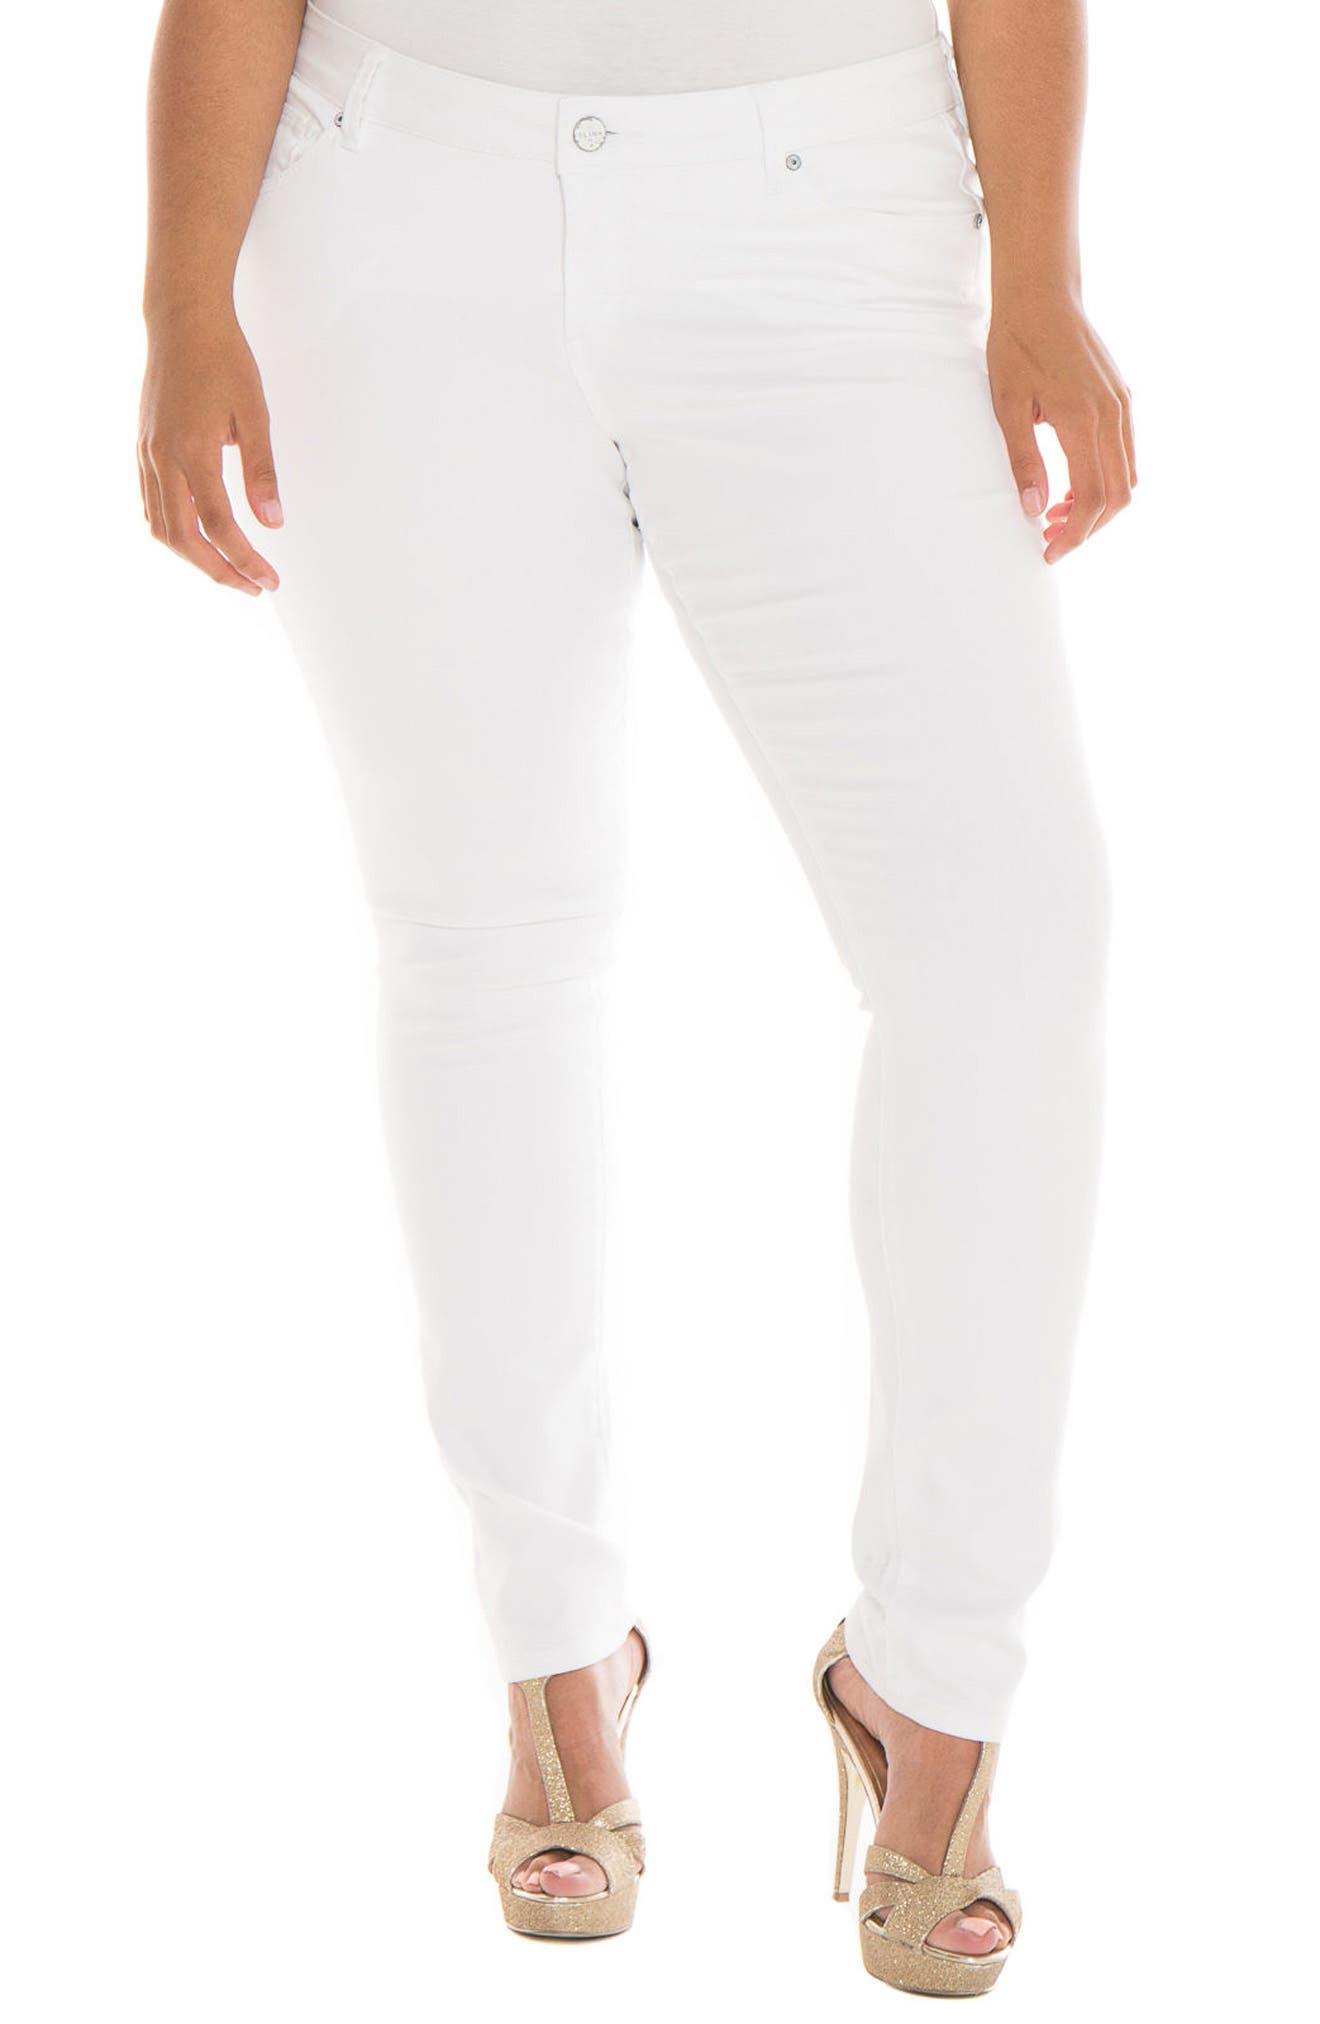 Main Image - SLINK Jeans Skinny Jeans (Charlie) (Plus Size)